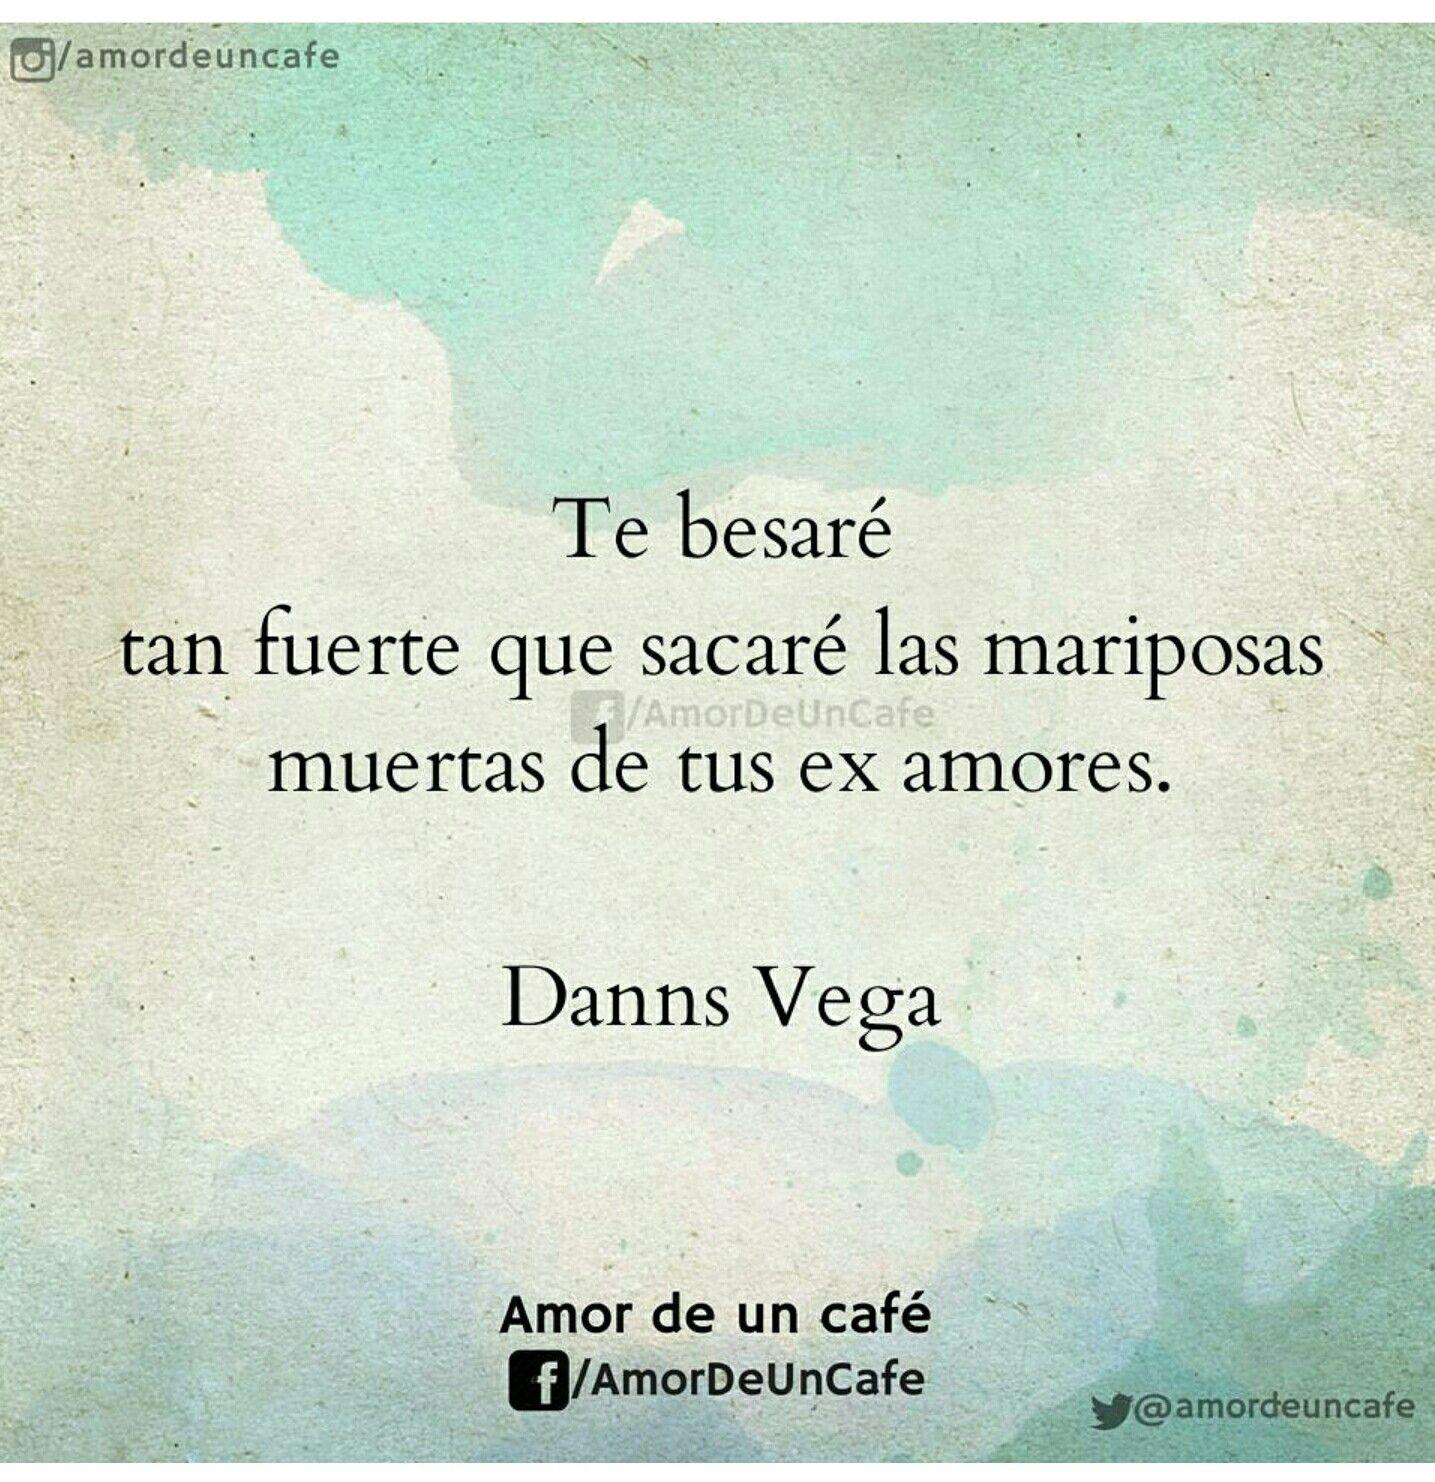 Frases Tumblr Frase Bonitas Frases De Amor Indirectas Para El Bonito Sensaciones Citas Sube Reina